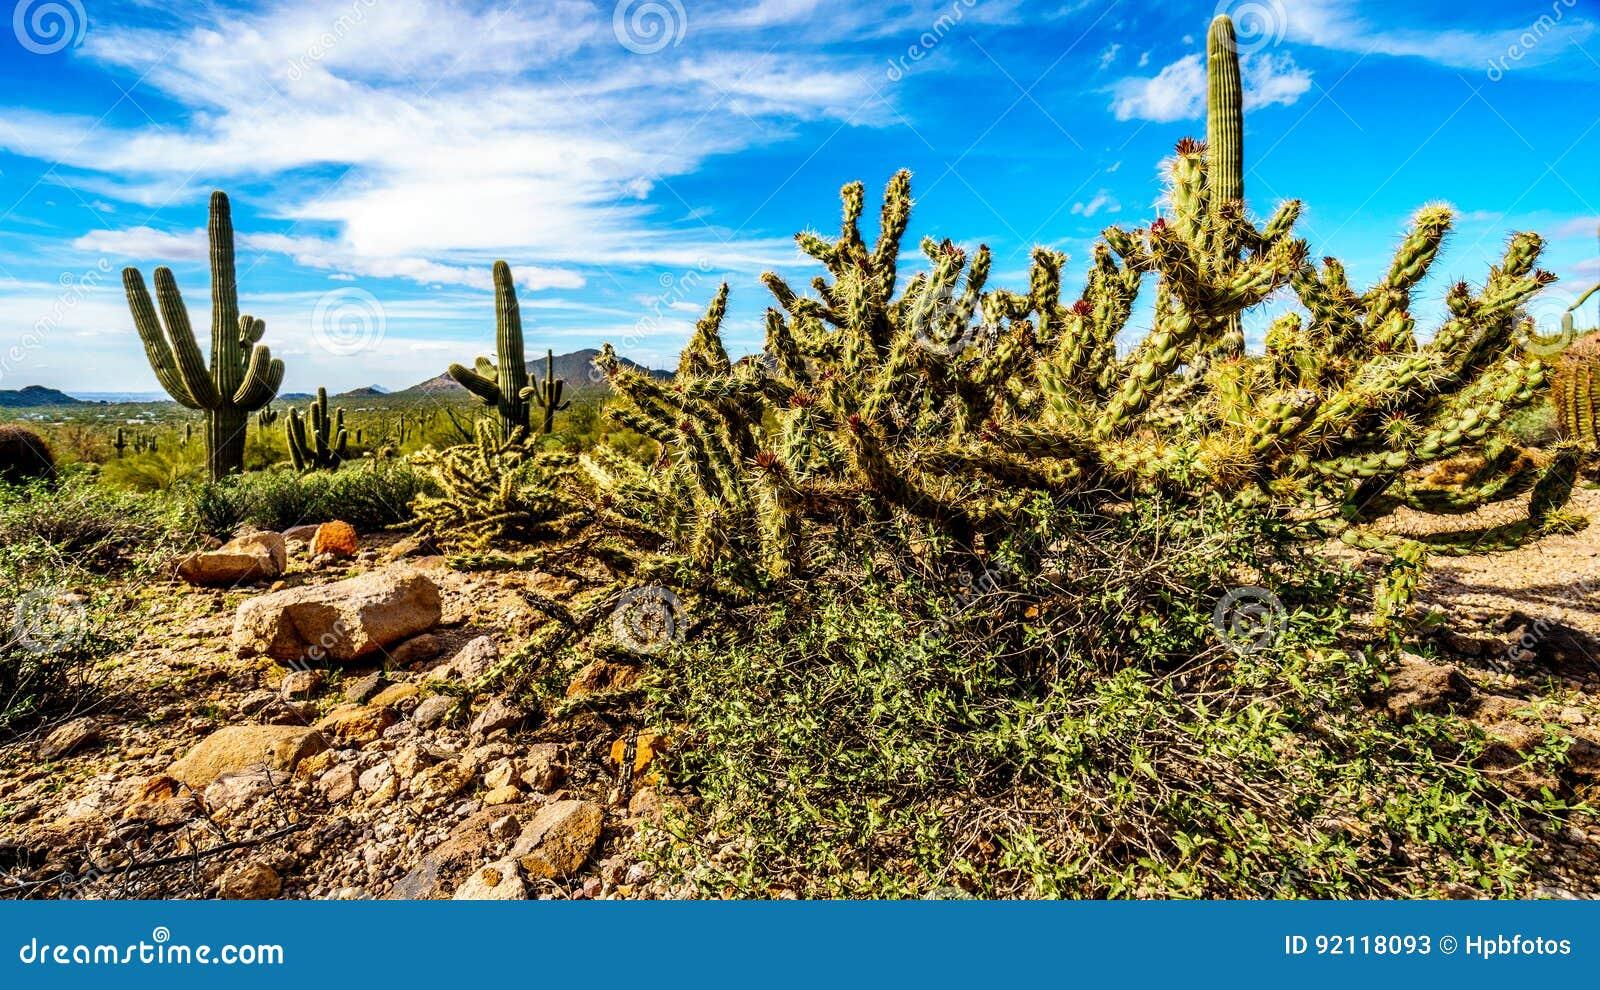 Pencil cactus is the semi desert landscape of Usery Mountain Regional Park near Phoenix Arizona